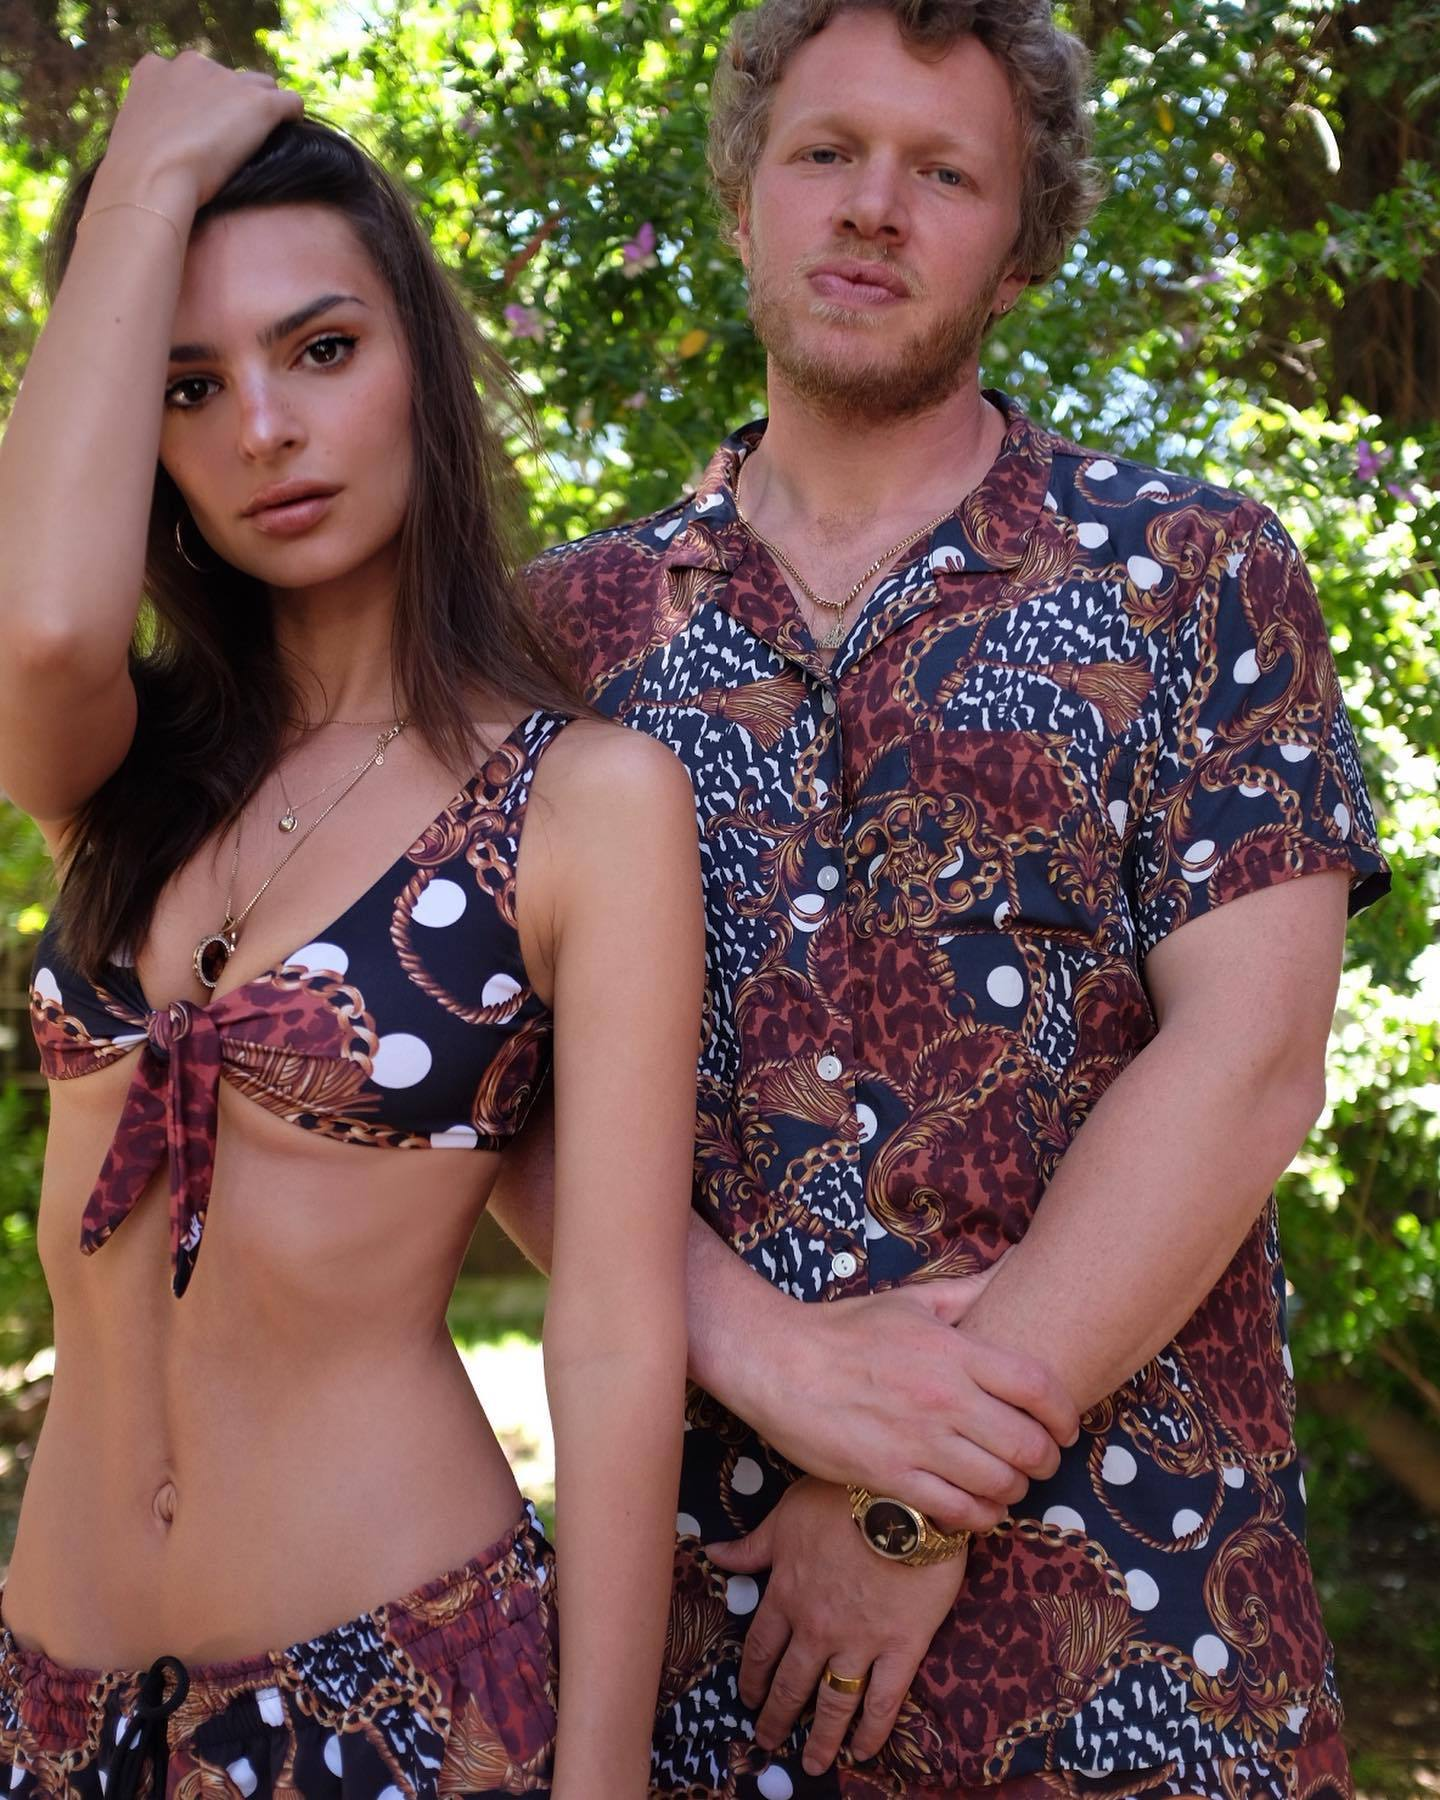 Emily Ratajkowski – Perfect Boobs In Sexy Braless Photoshoot For Inamorata Collection 0006